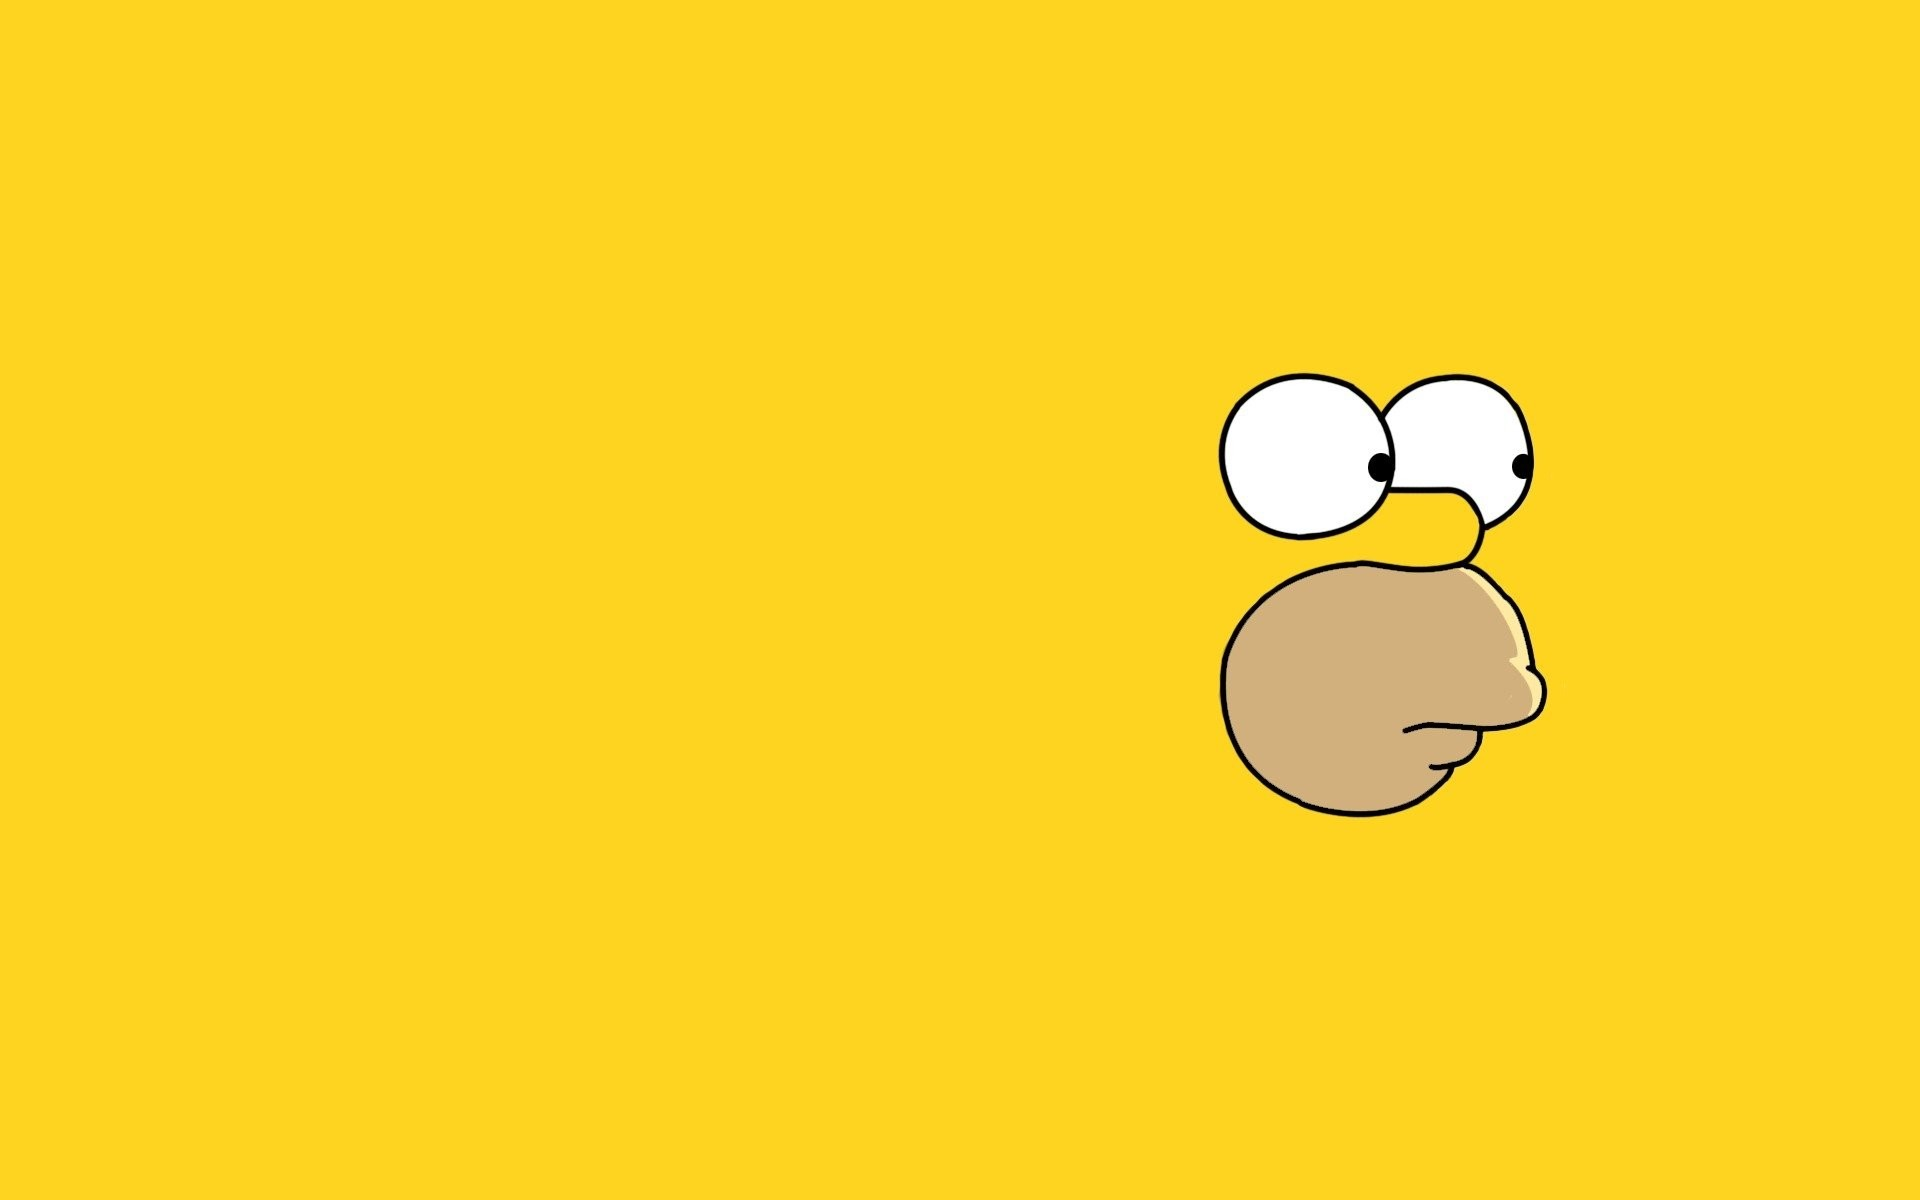 The Simpsons Wallpaper for Desktop (68+